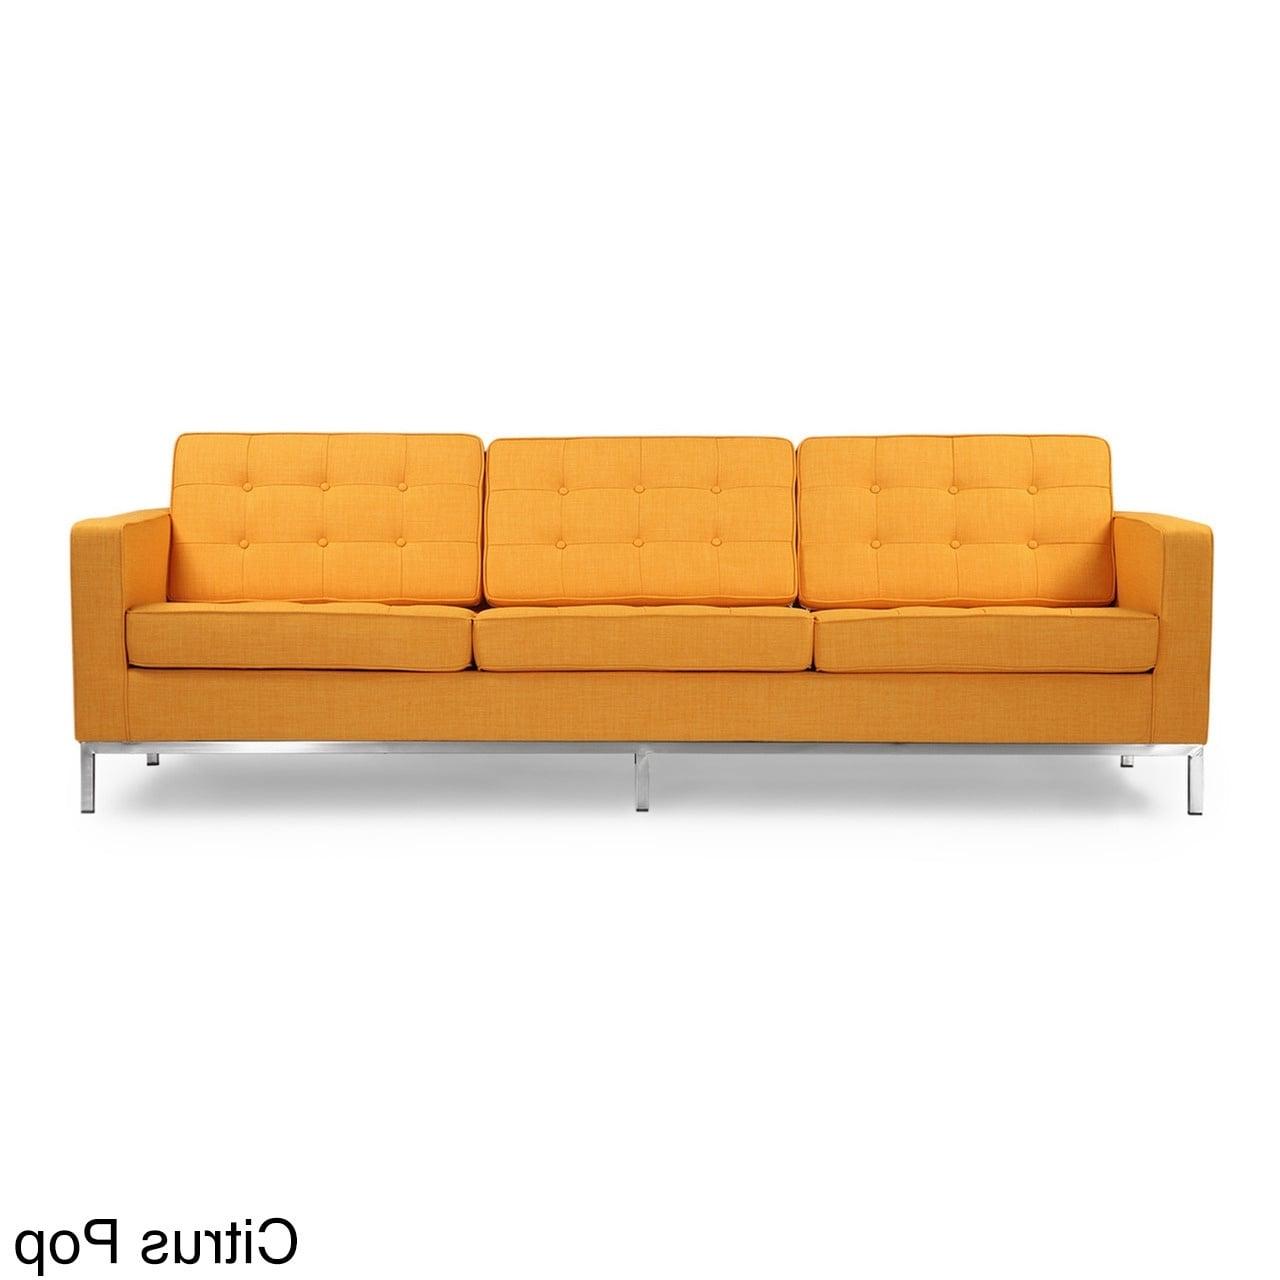 Kardiel Florence Knoll Style Sofa 3 Seat, Premium Fabric Within 2019 Florence Knoll Fabric Sofas (Gallery 4 of 20)